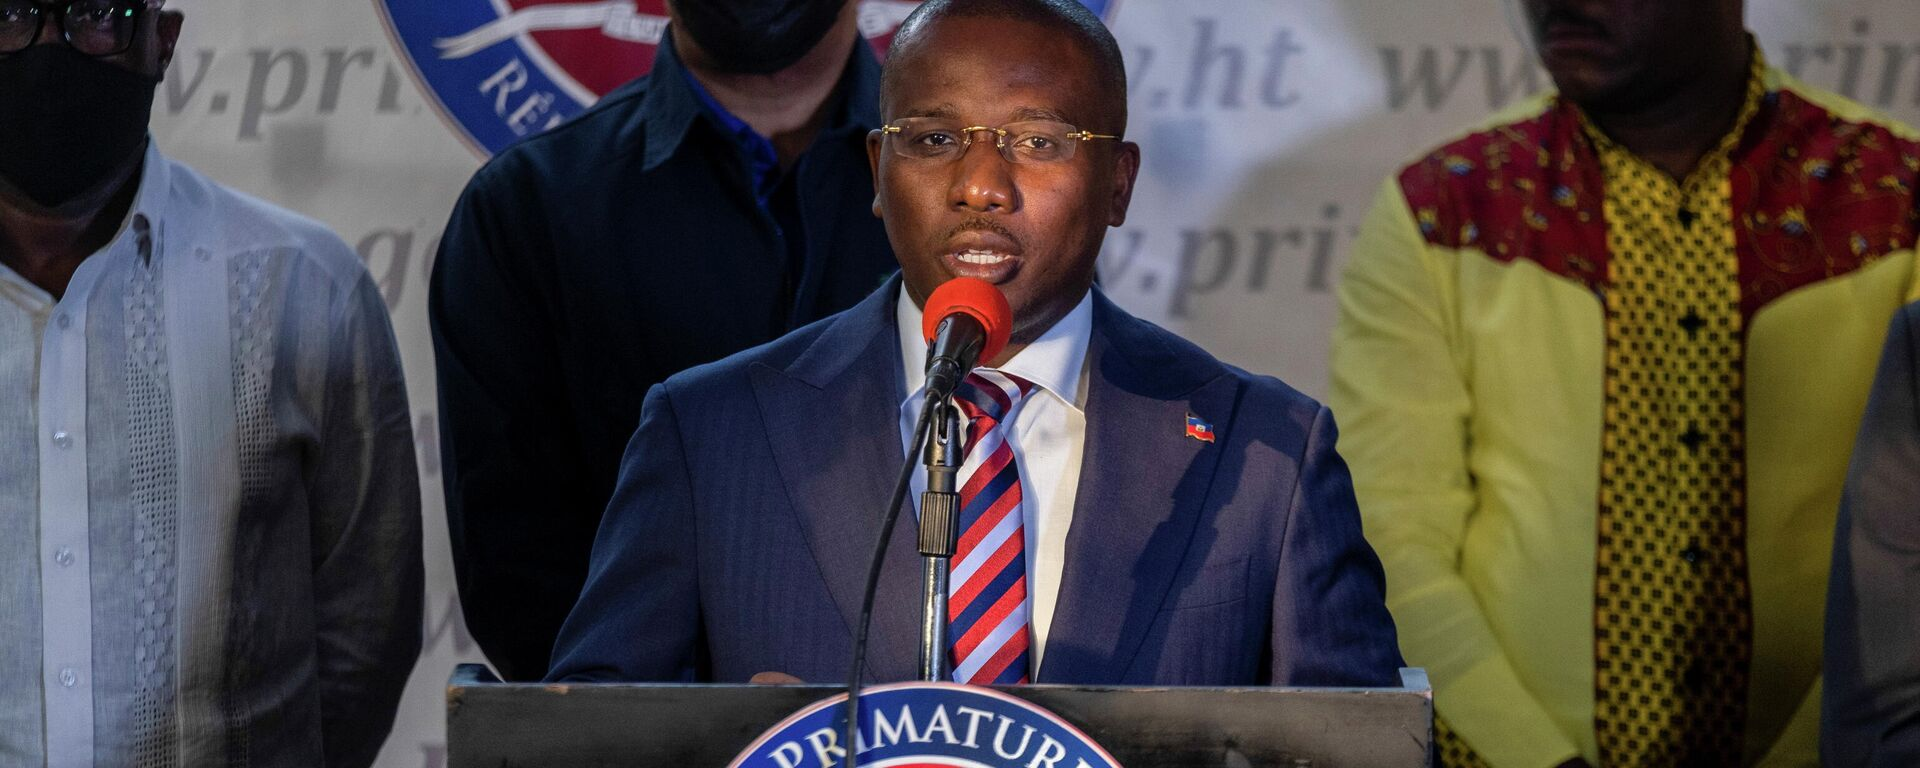 El primer ministro de Haití en funciones, Claude Joseph - Sputnik Mundo, 1920, 15.07.2021